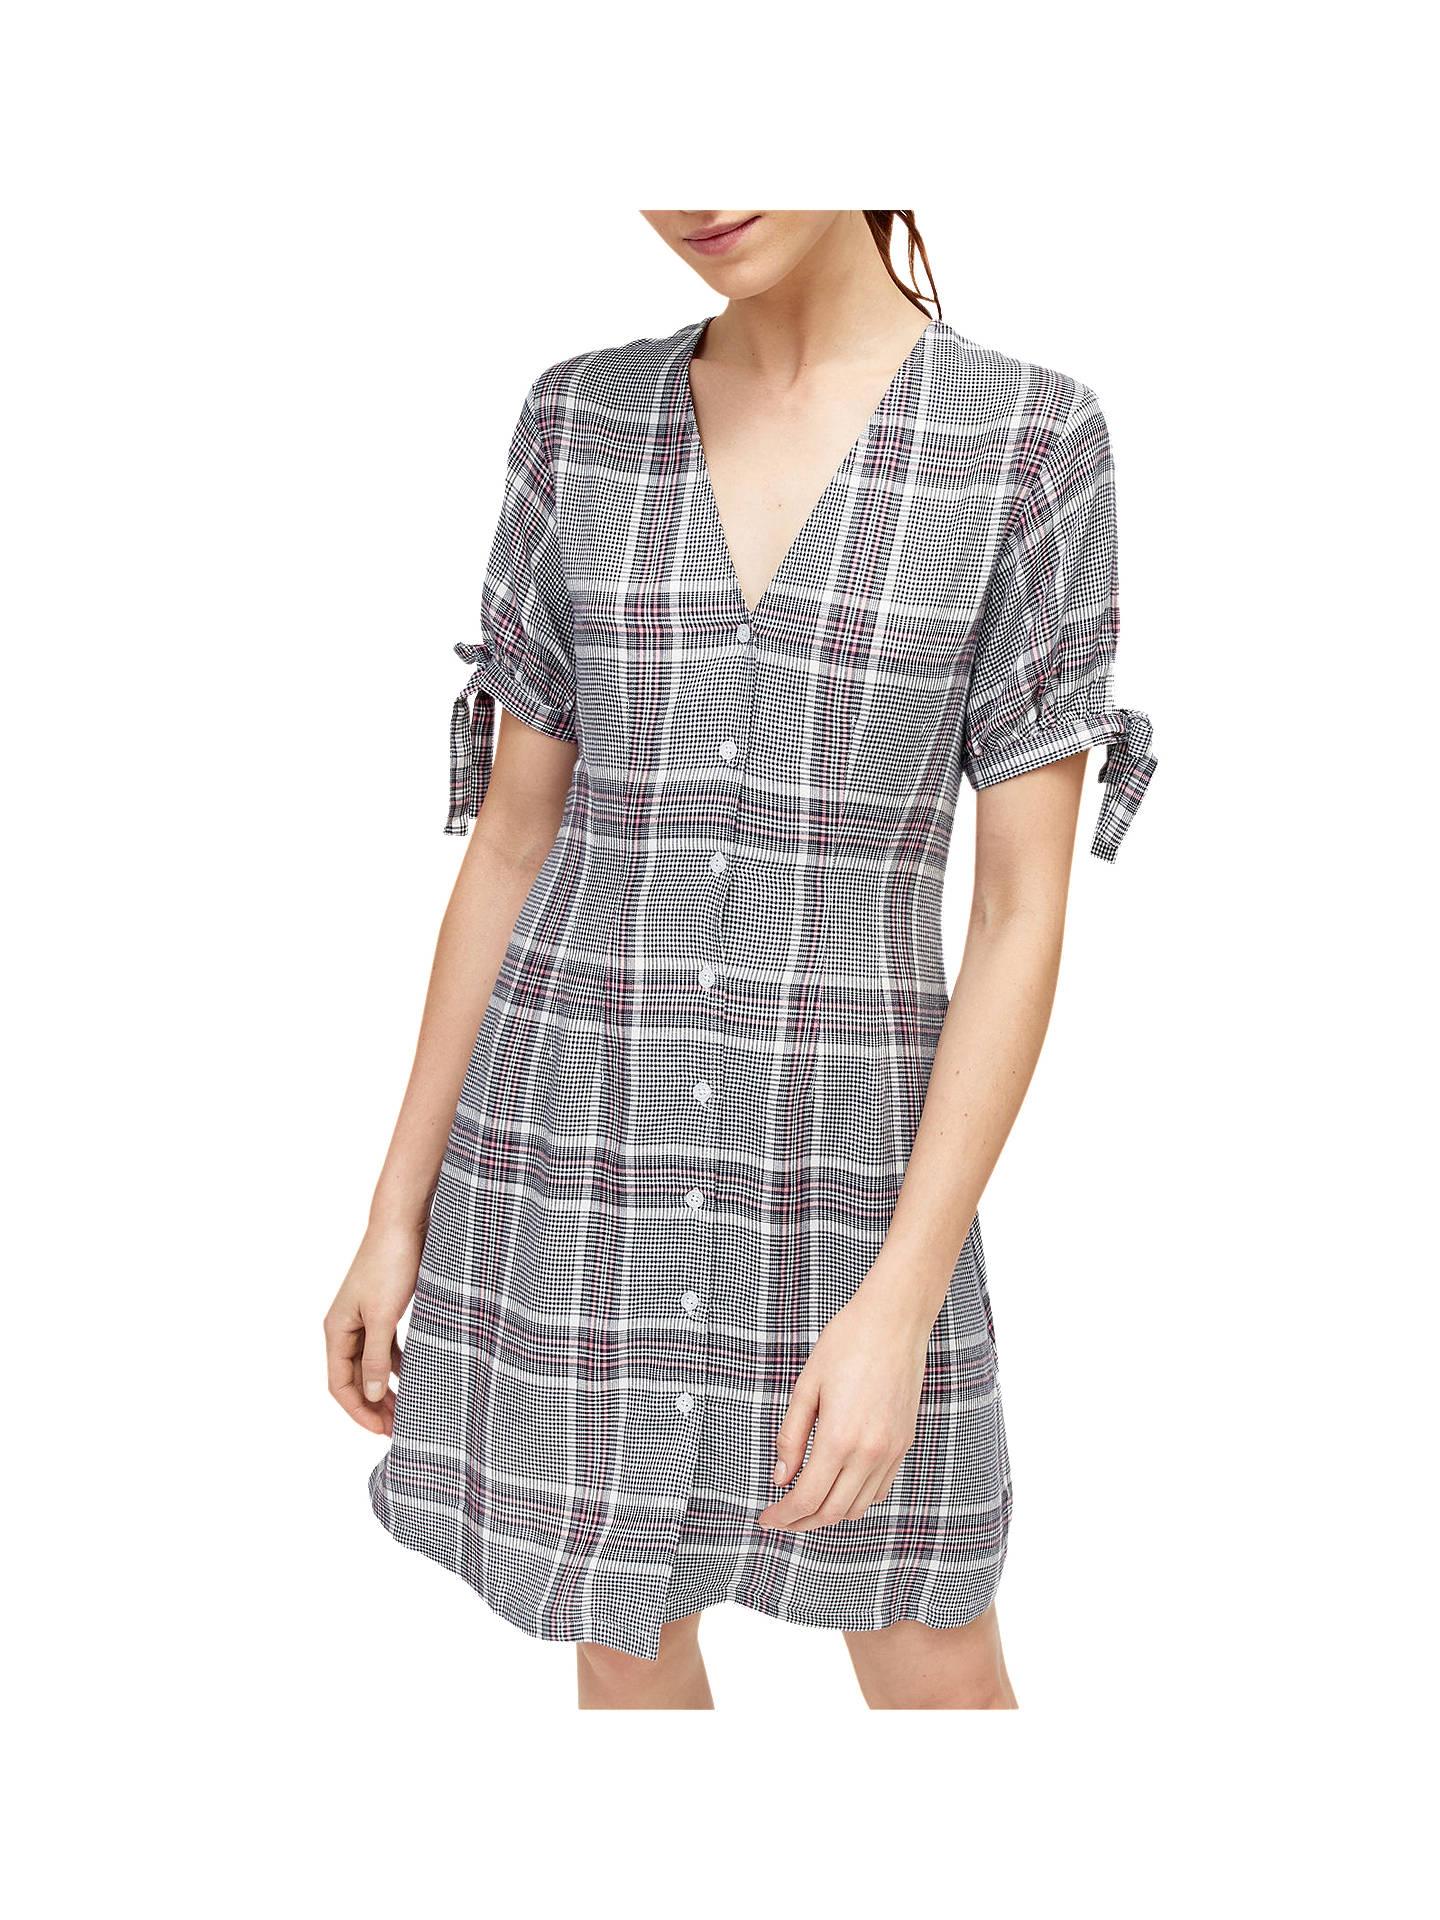 bcea5aa360695 Buy Warehouse Check Print Tea Dress, Grey, 6 Online at johnlewis.com ...